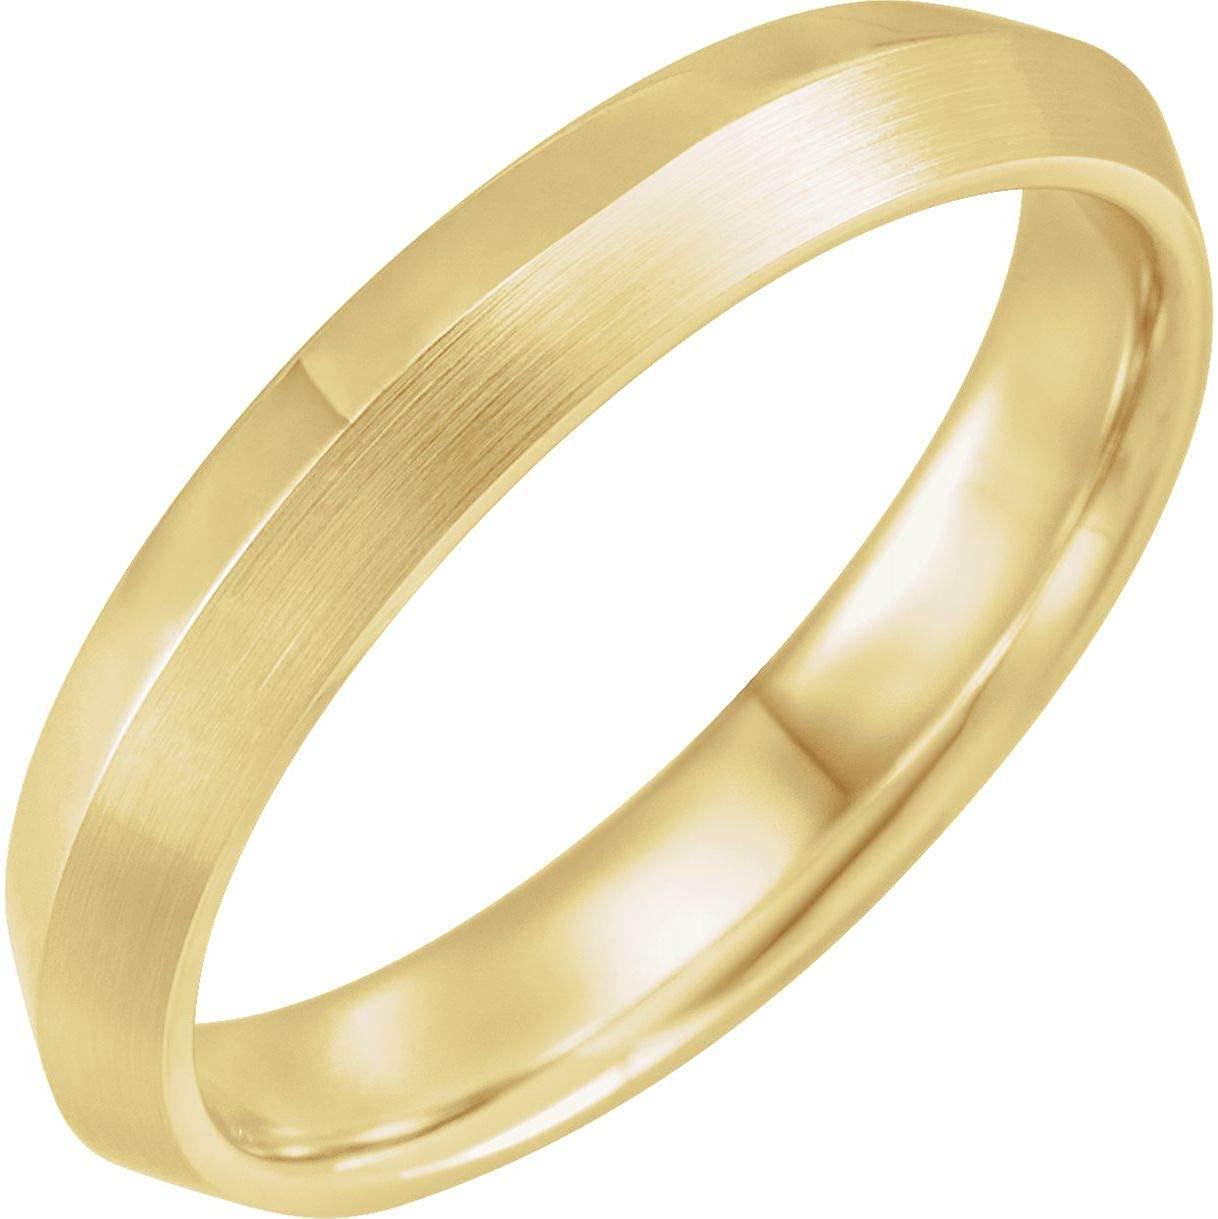 Bonyak Jewelry 14k Yellow Gold 4mm Knife-Edge Band with Satin Finish - Size 13